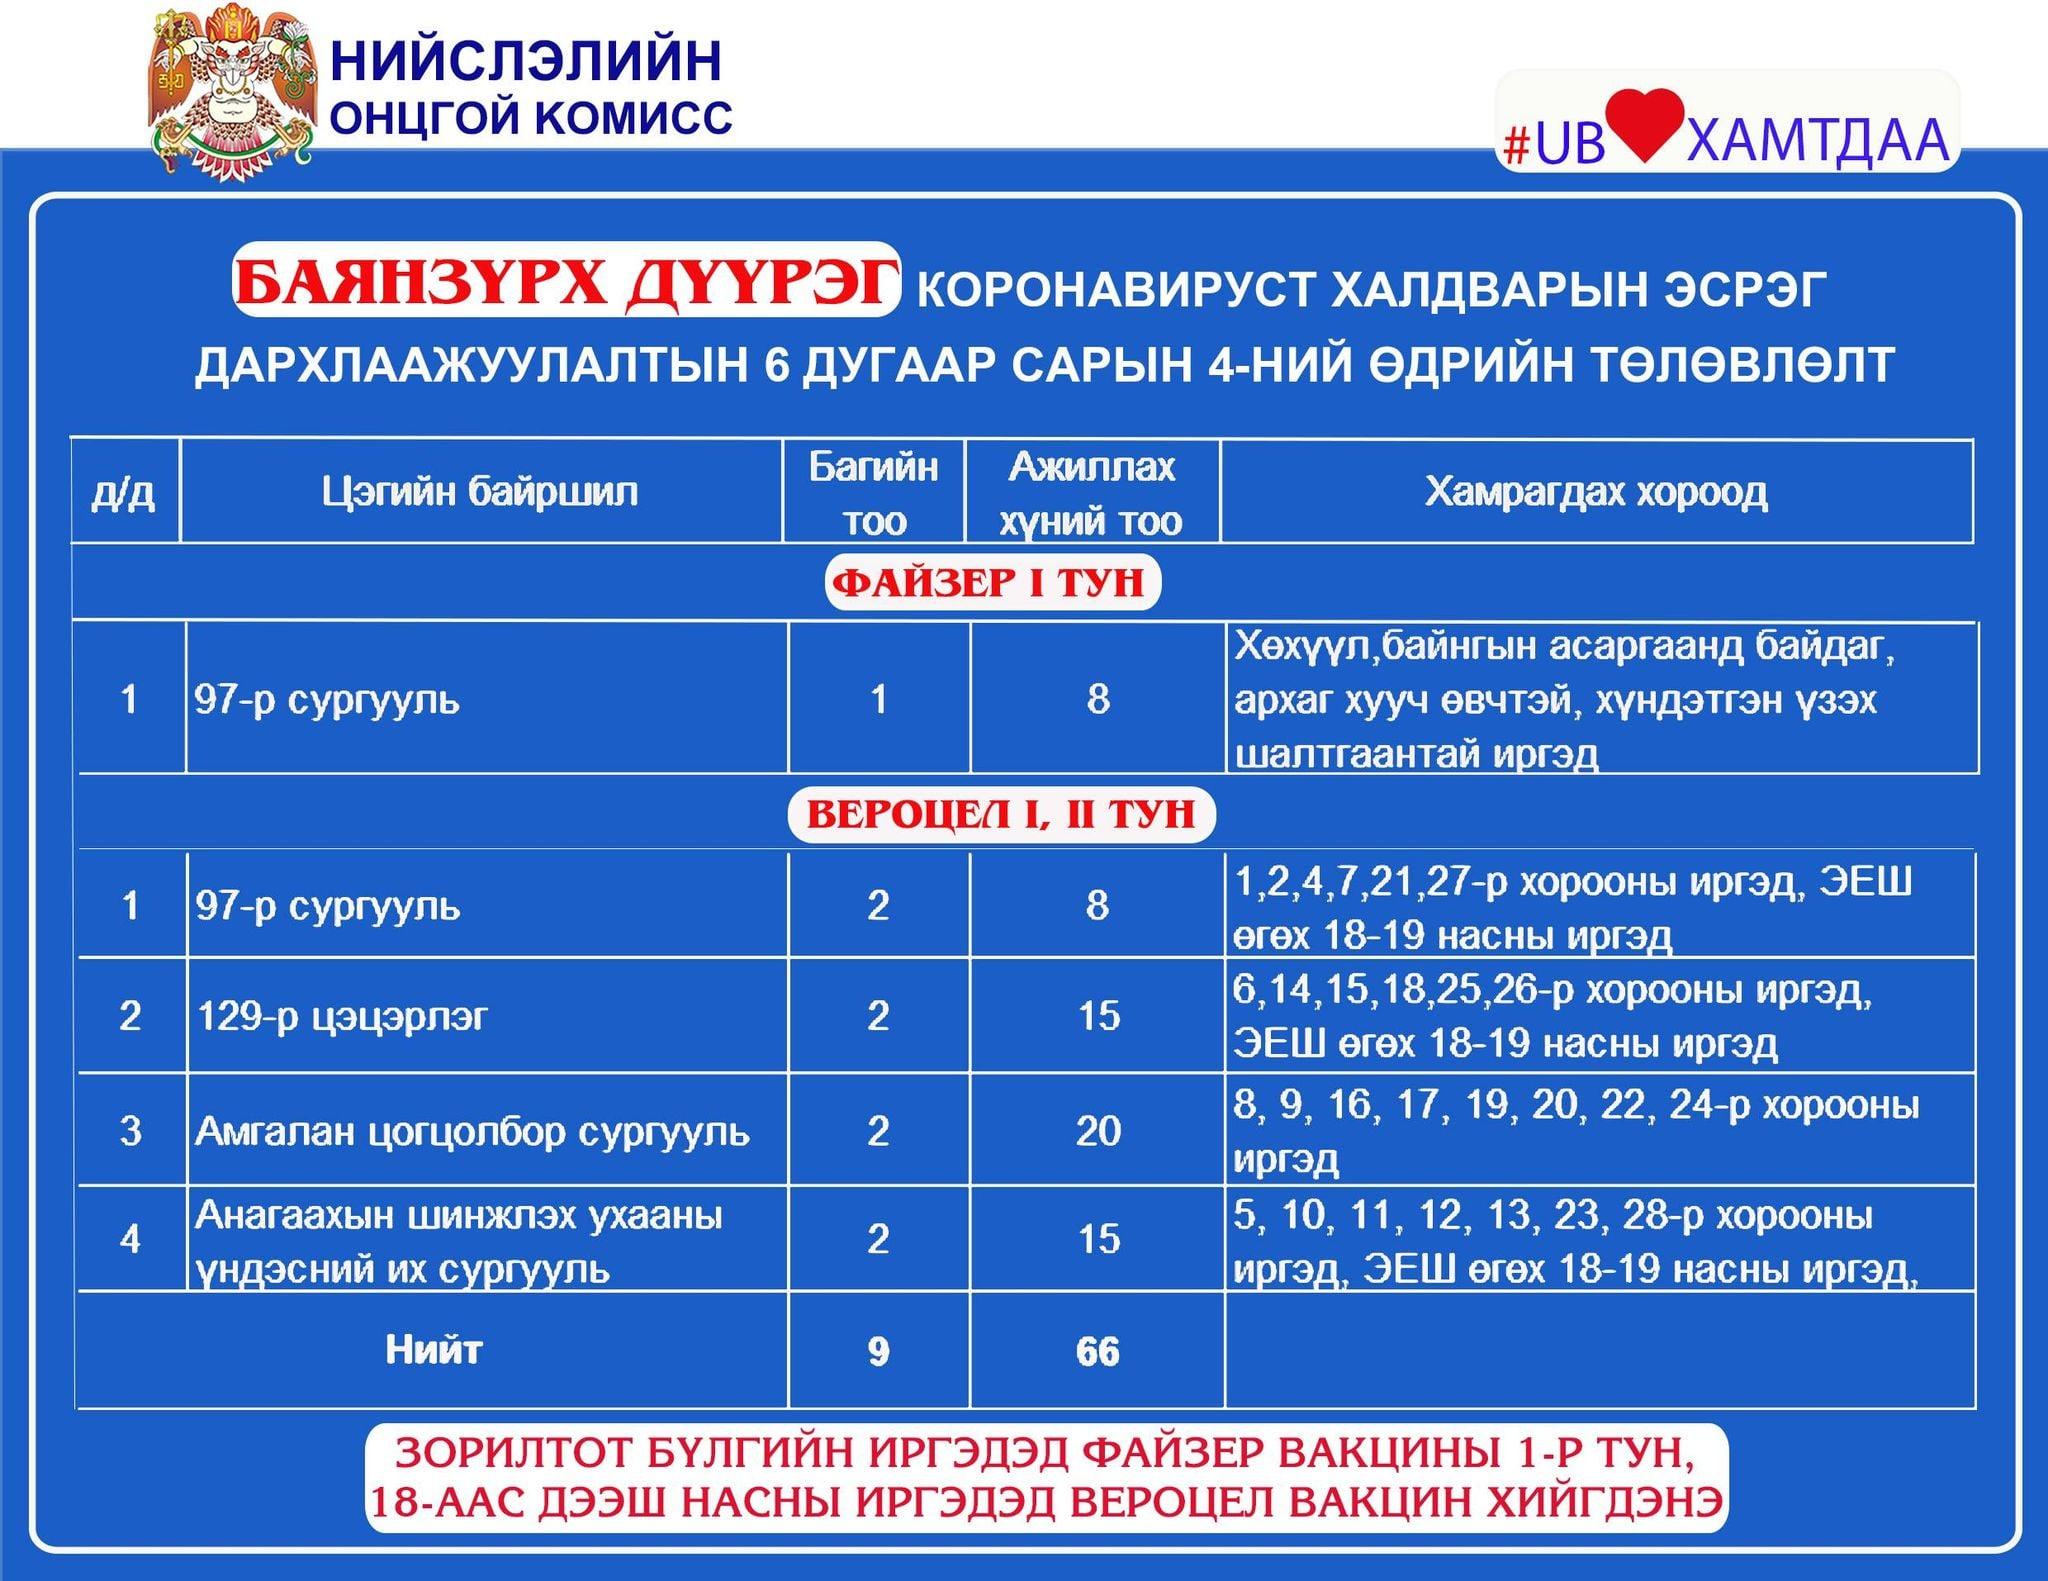 195604421_2933236556953304_3929975102810647082_n